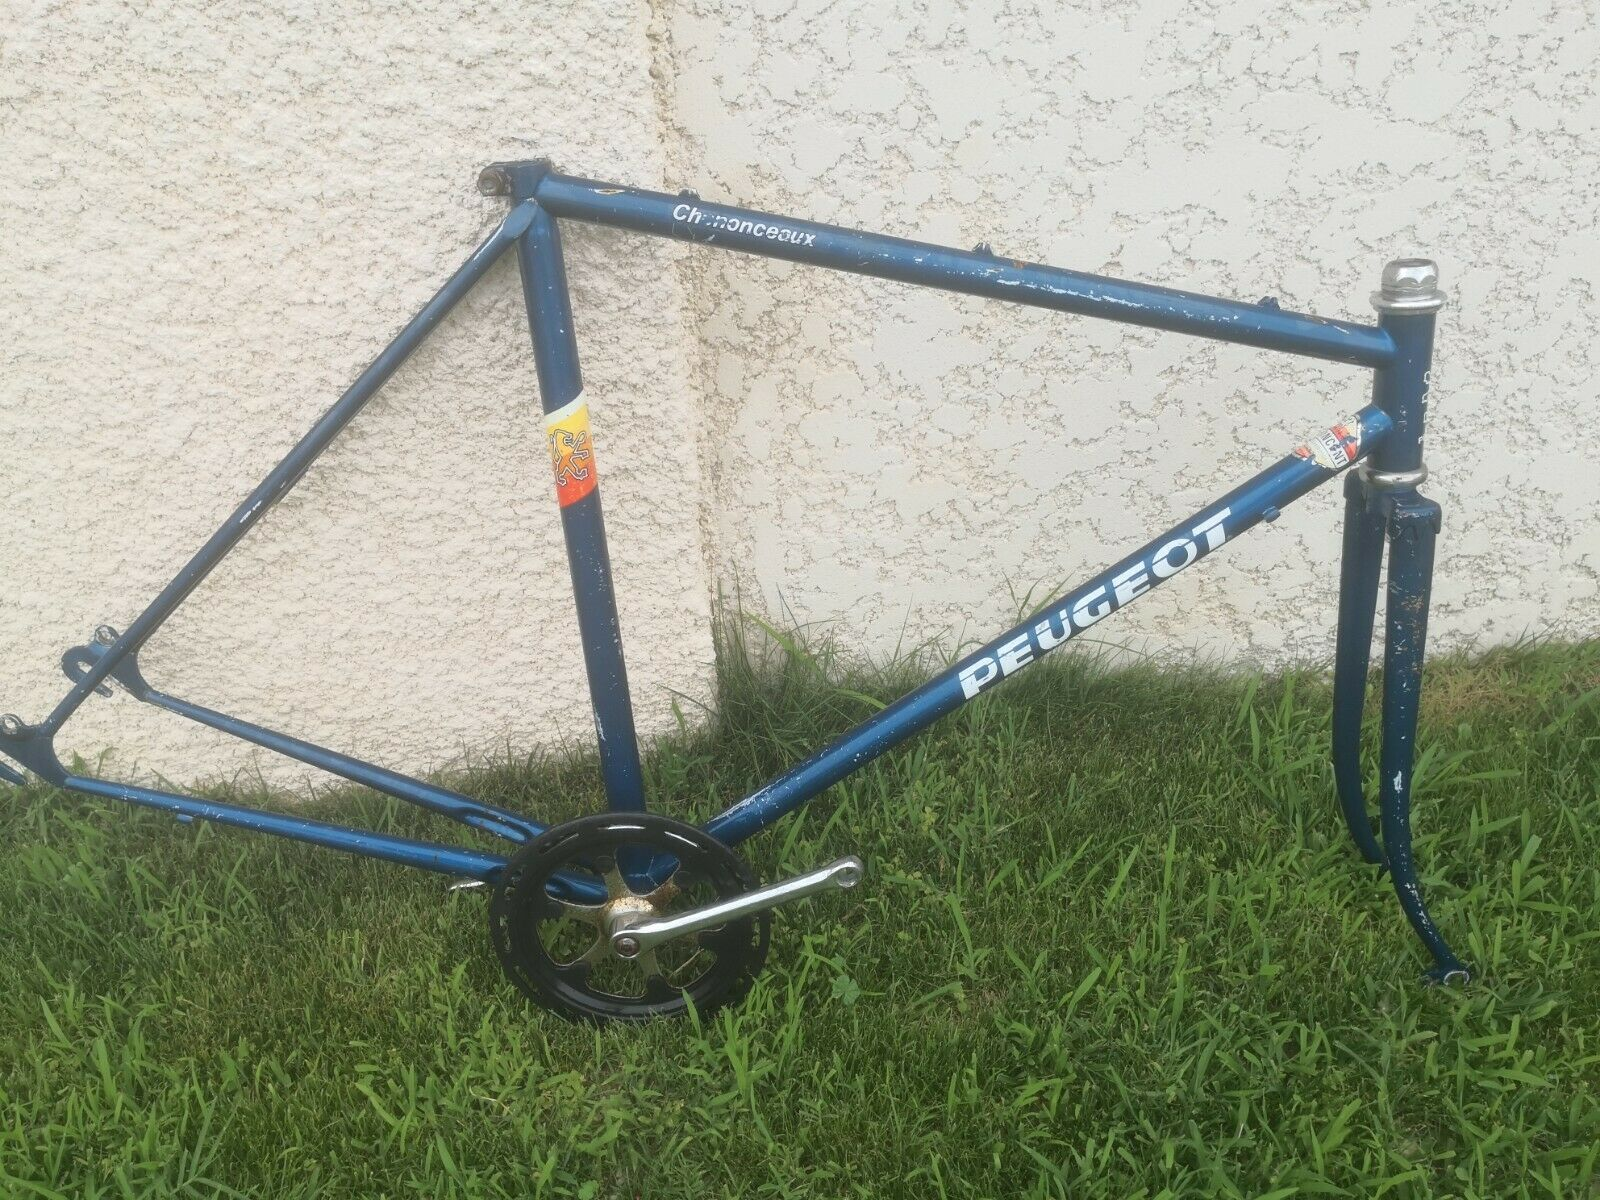 PEUGEOT CADRE  ANCIEN VÉLO  VINTAGE FRENCH  BICYCLE FRAME 54 old bike